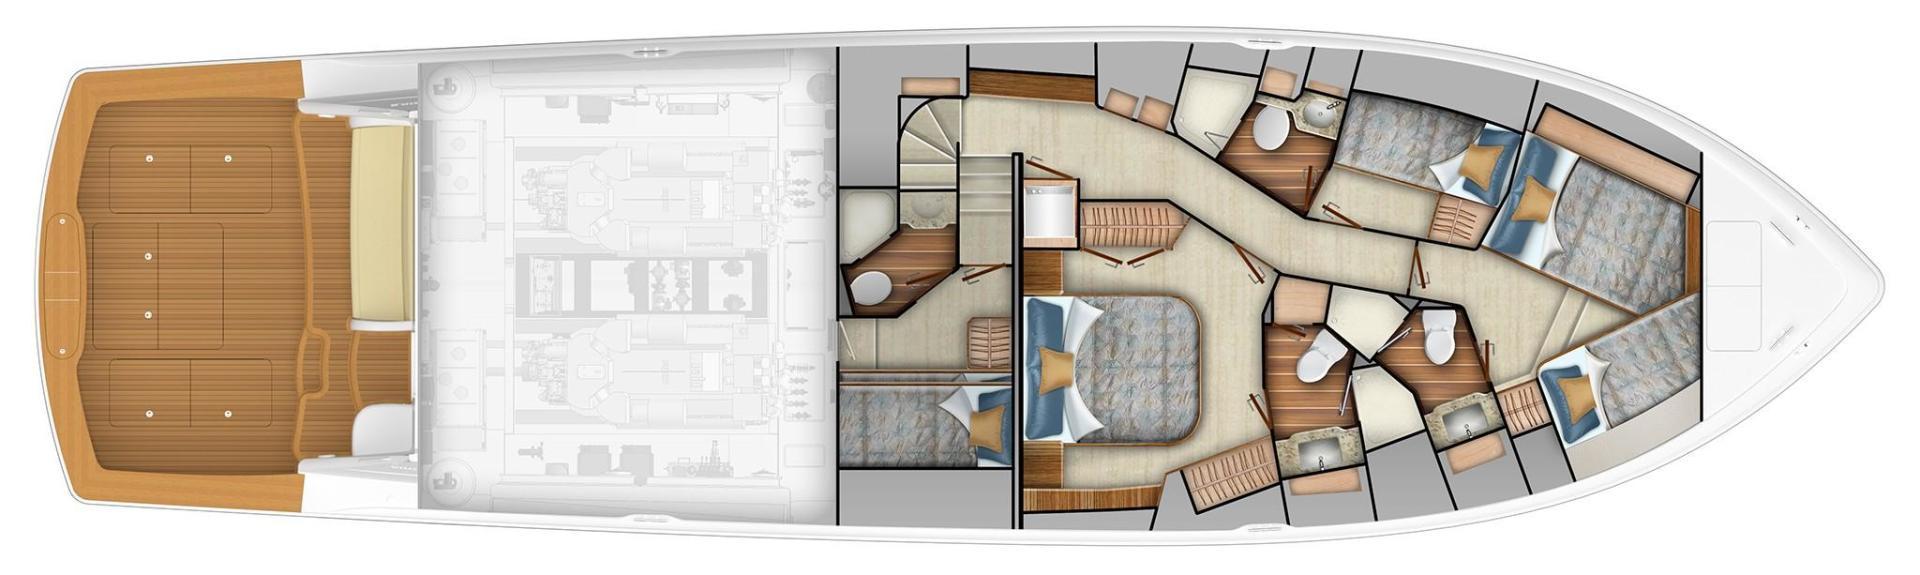 Lower Interior Layout